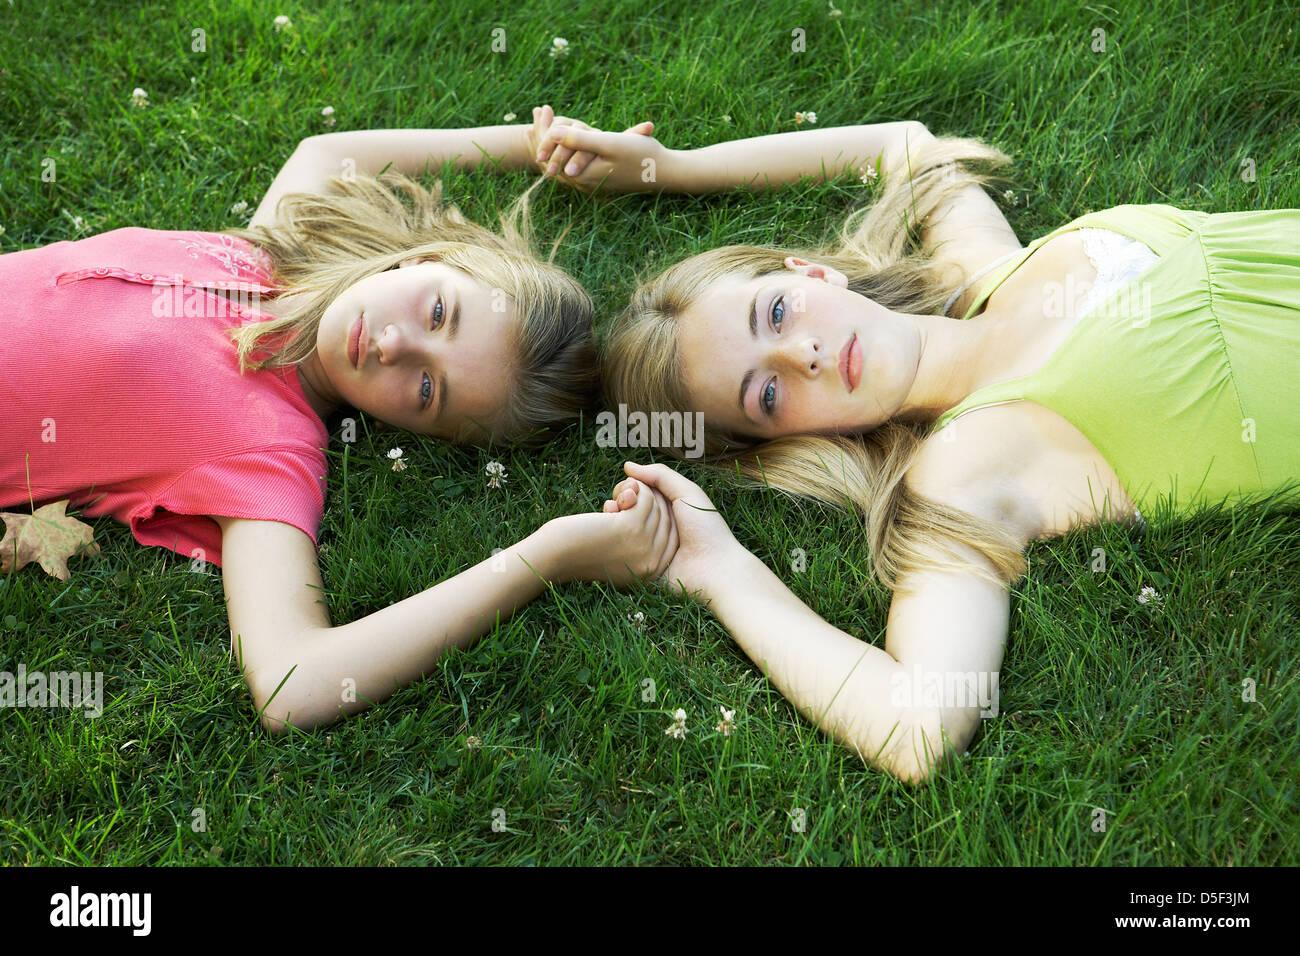 Bella teen e tween sorelle tenendo le mani Immagini Stock